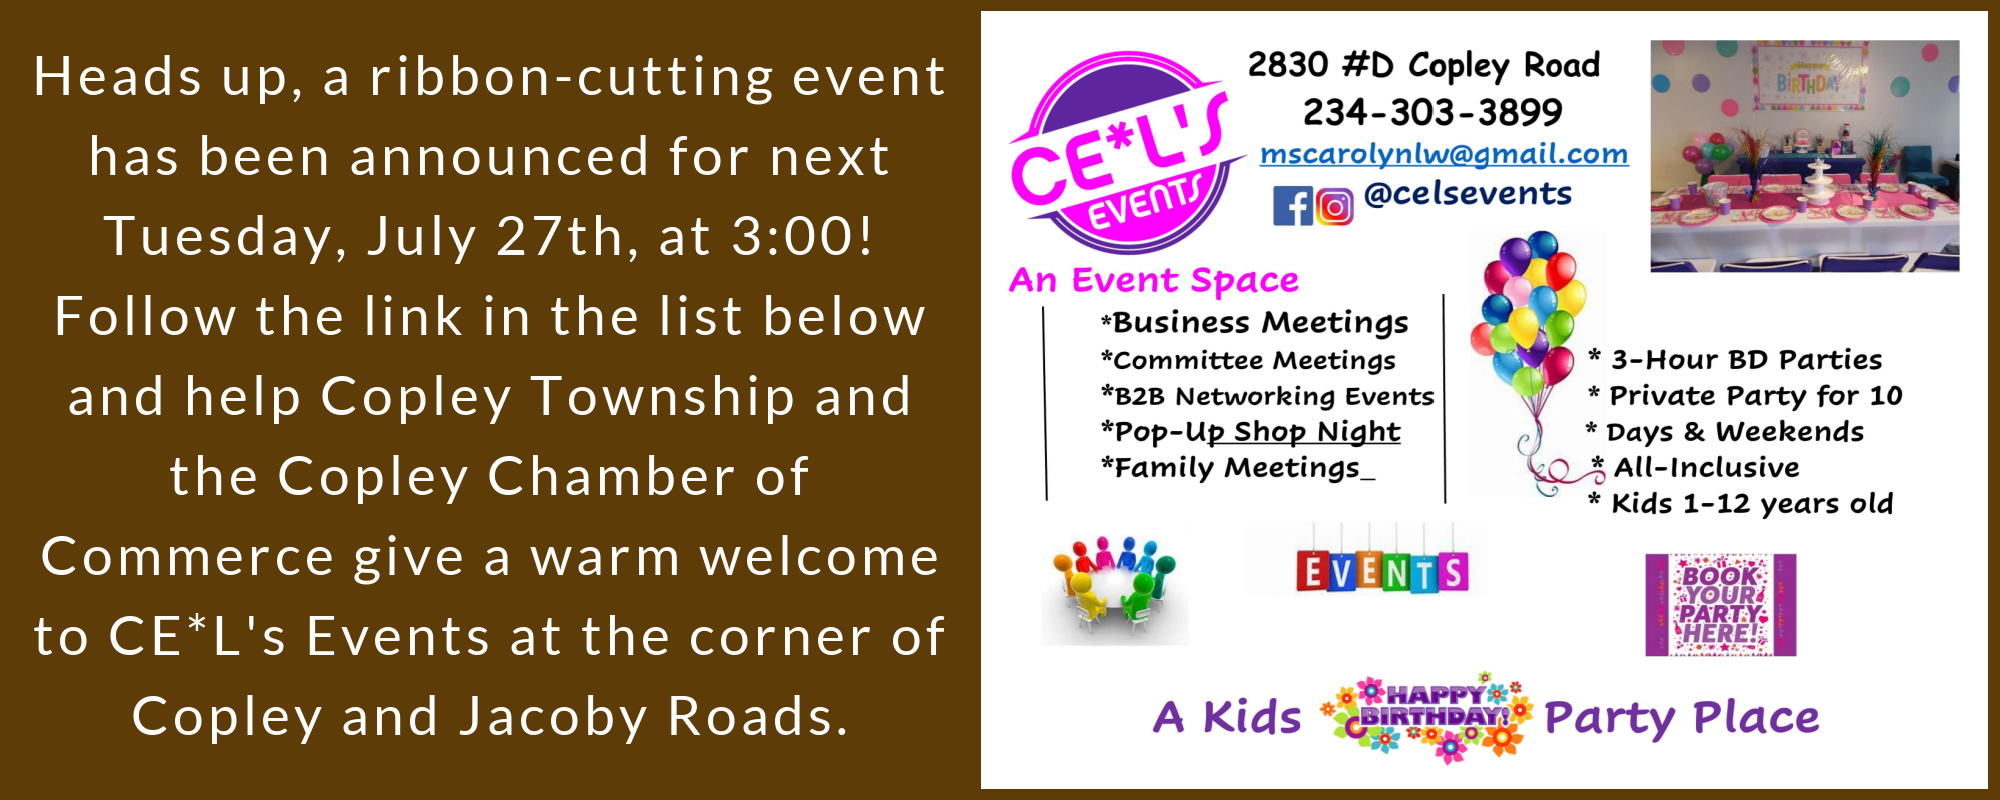 Ribbon Cutting CE*L's Events